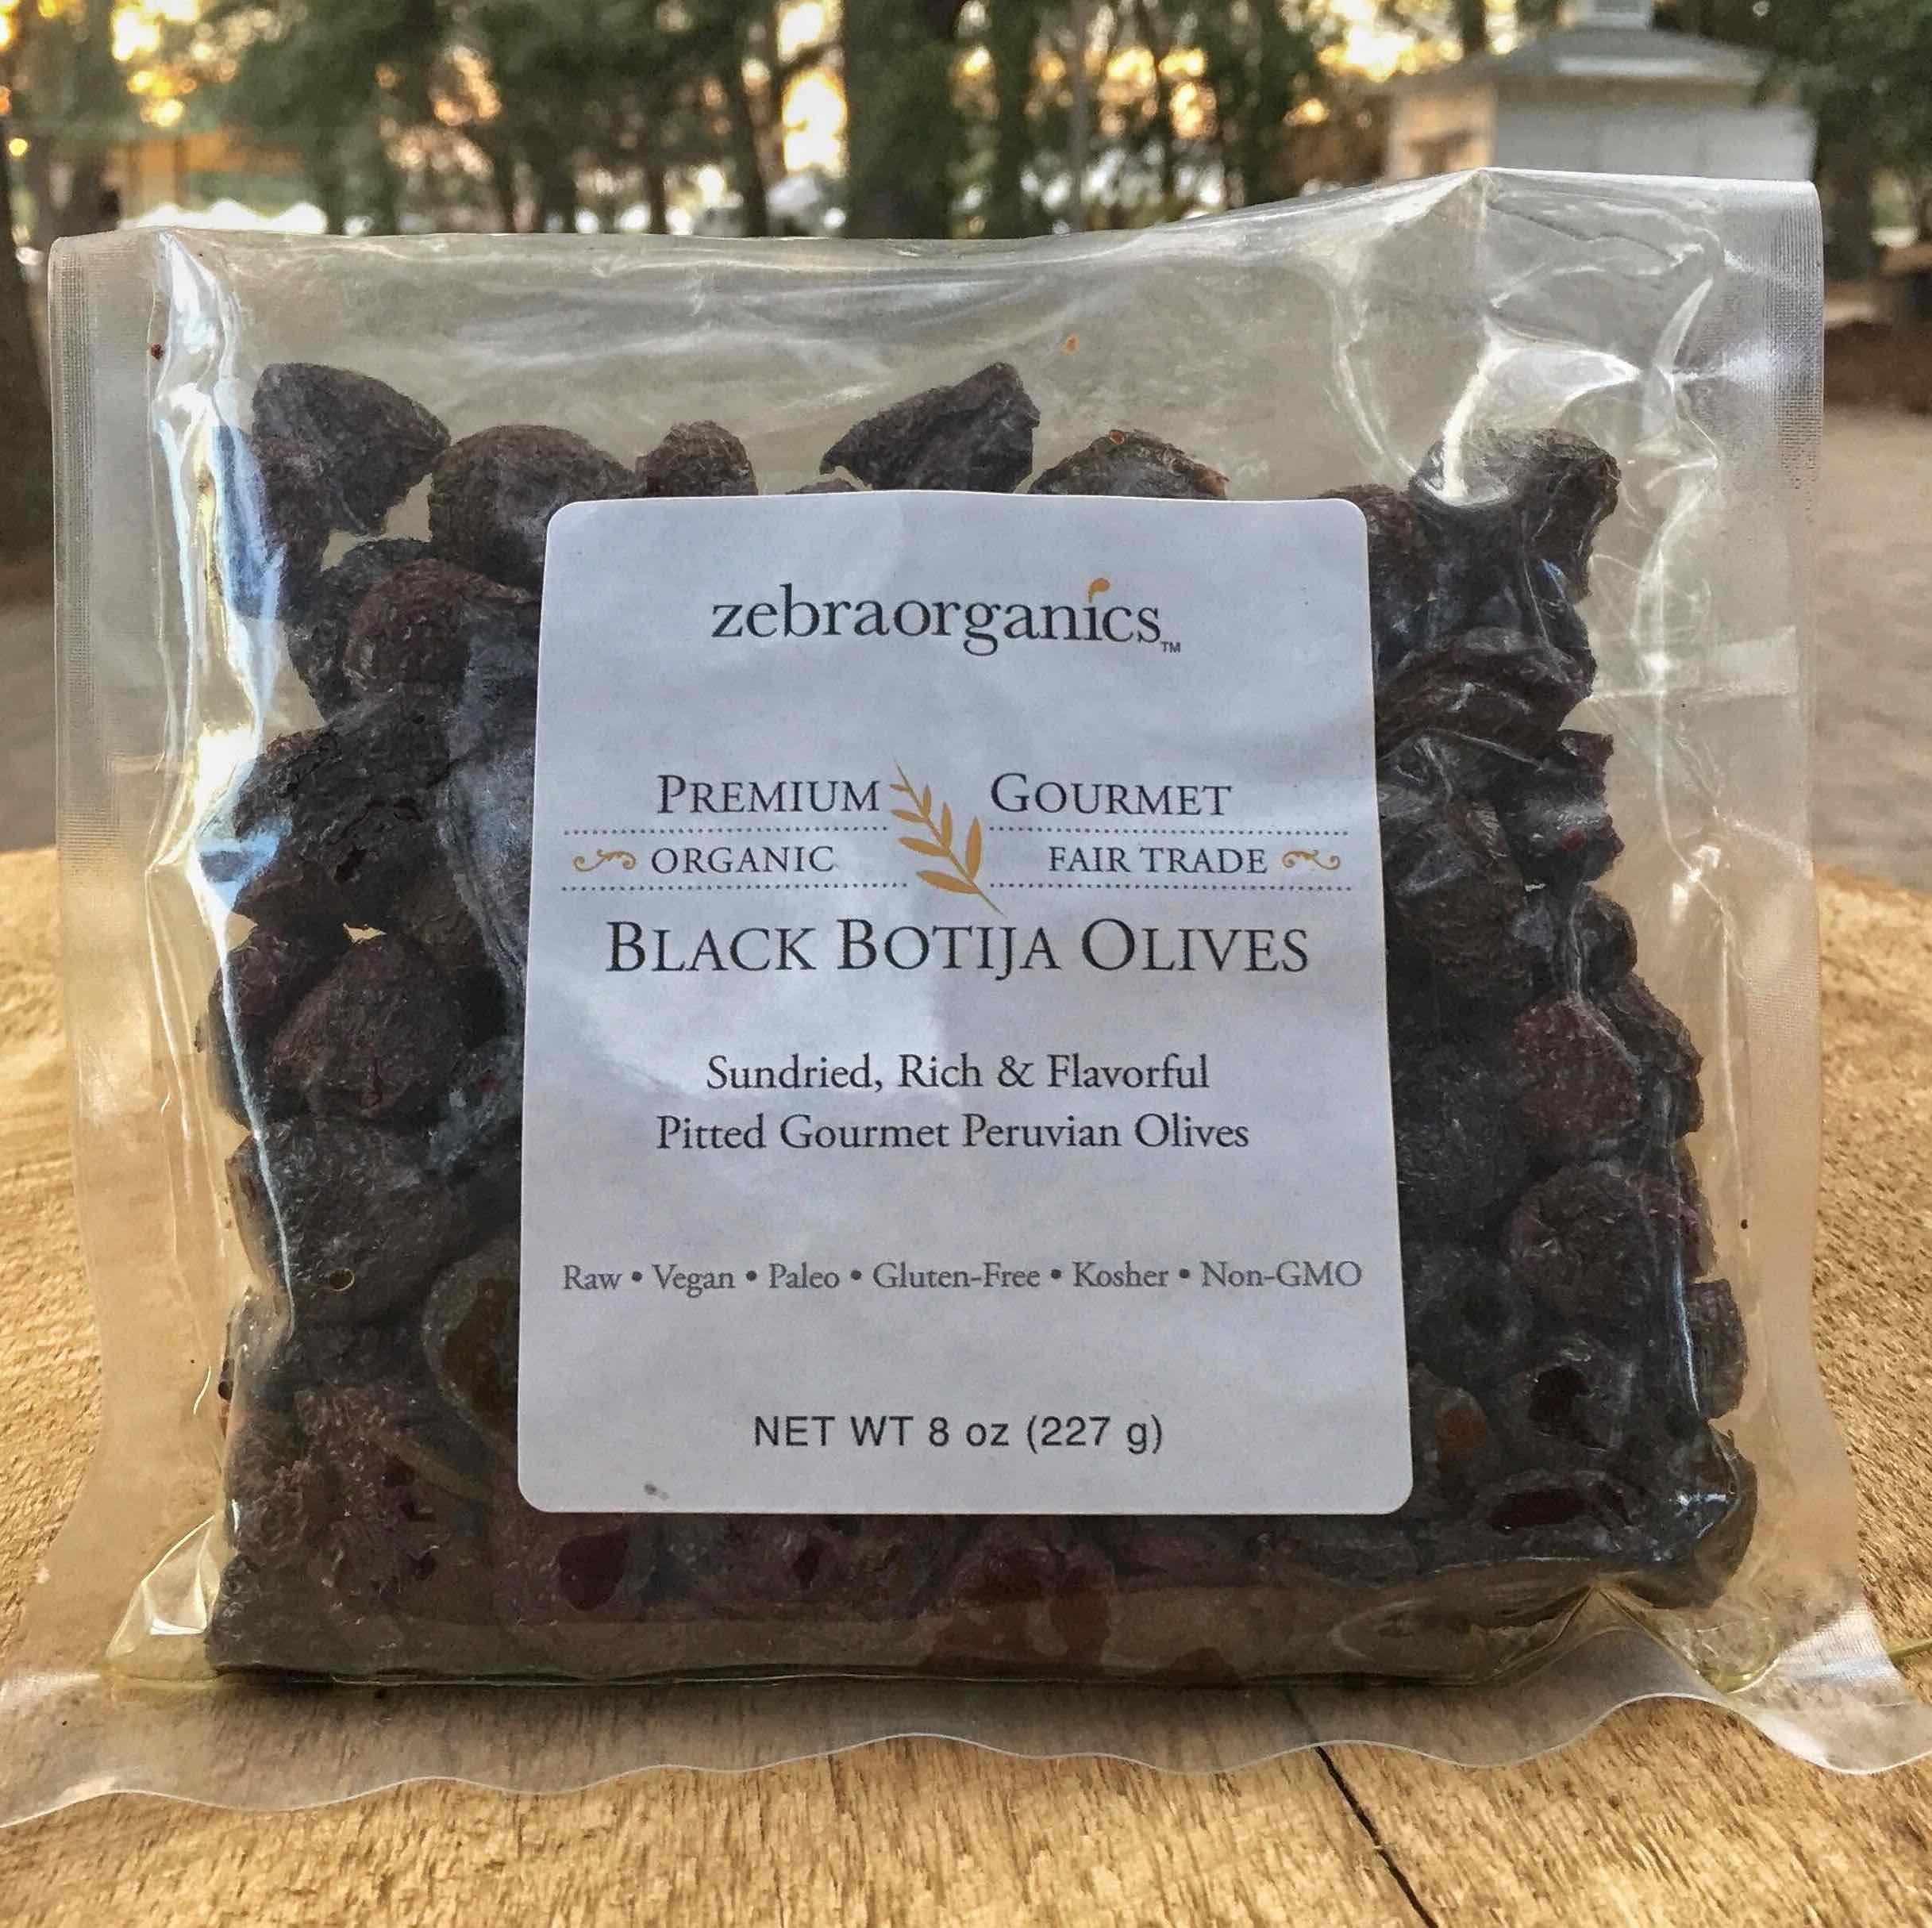 Organic Peruvian Black Botija Olives